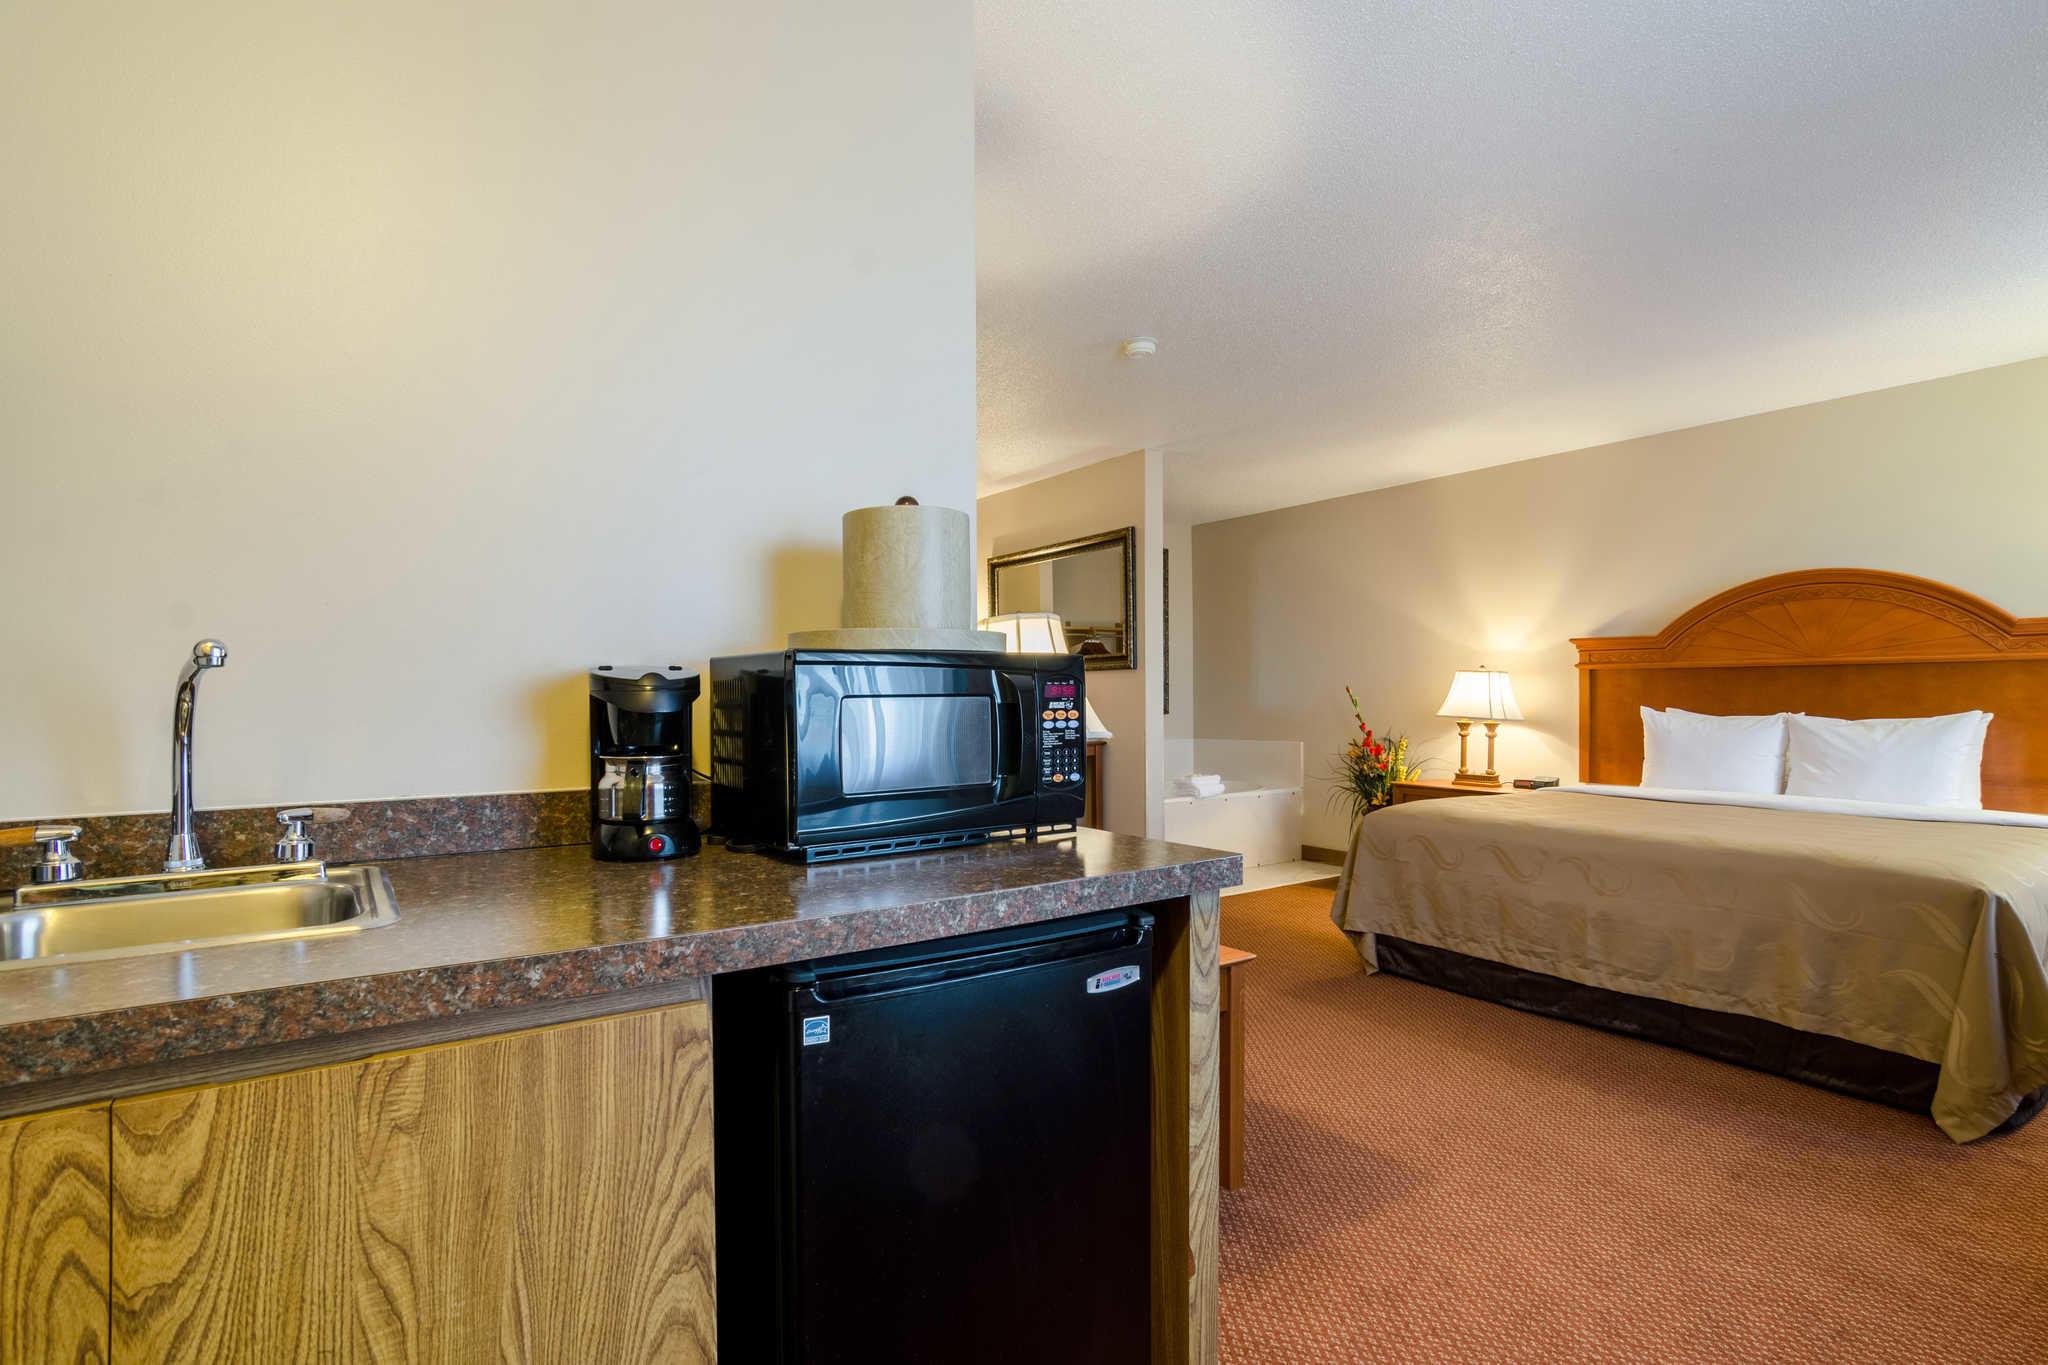 Quality Inn image 40